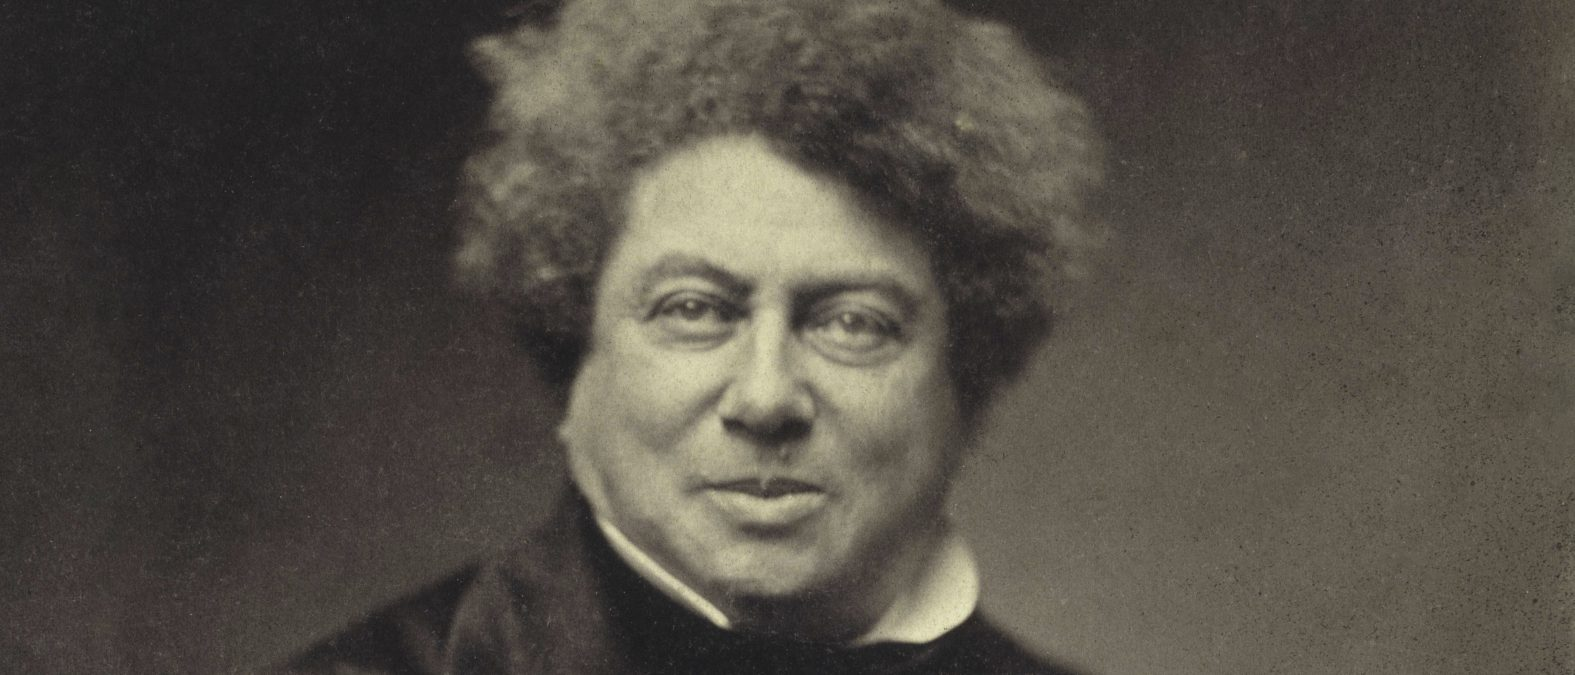 Nadar, Alexandre Dumas padre a 53 anni (1802-1870).